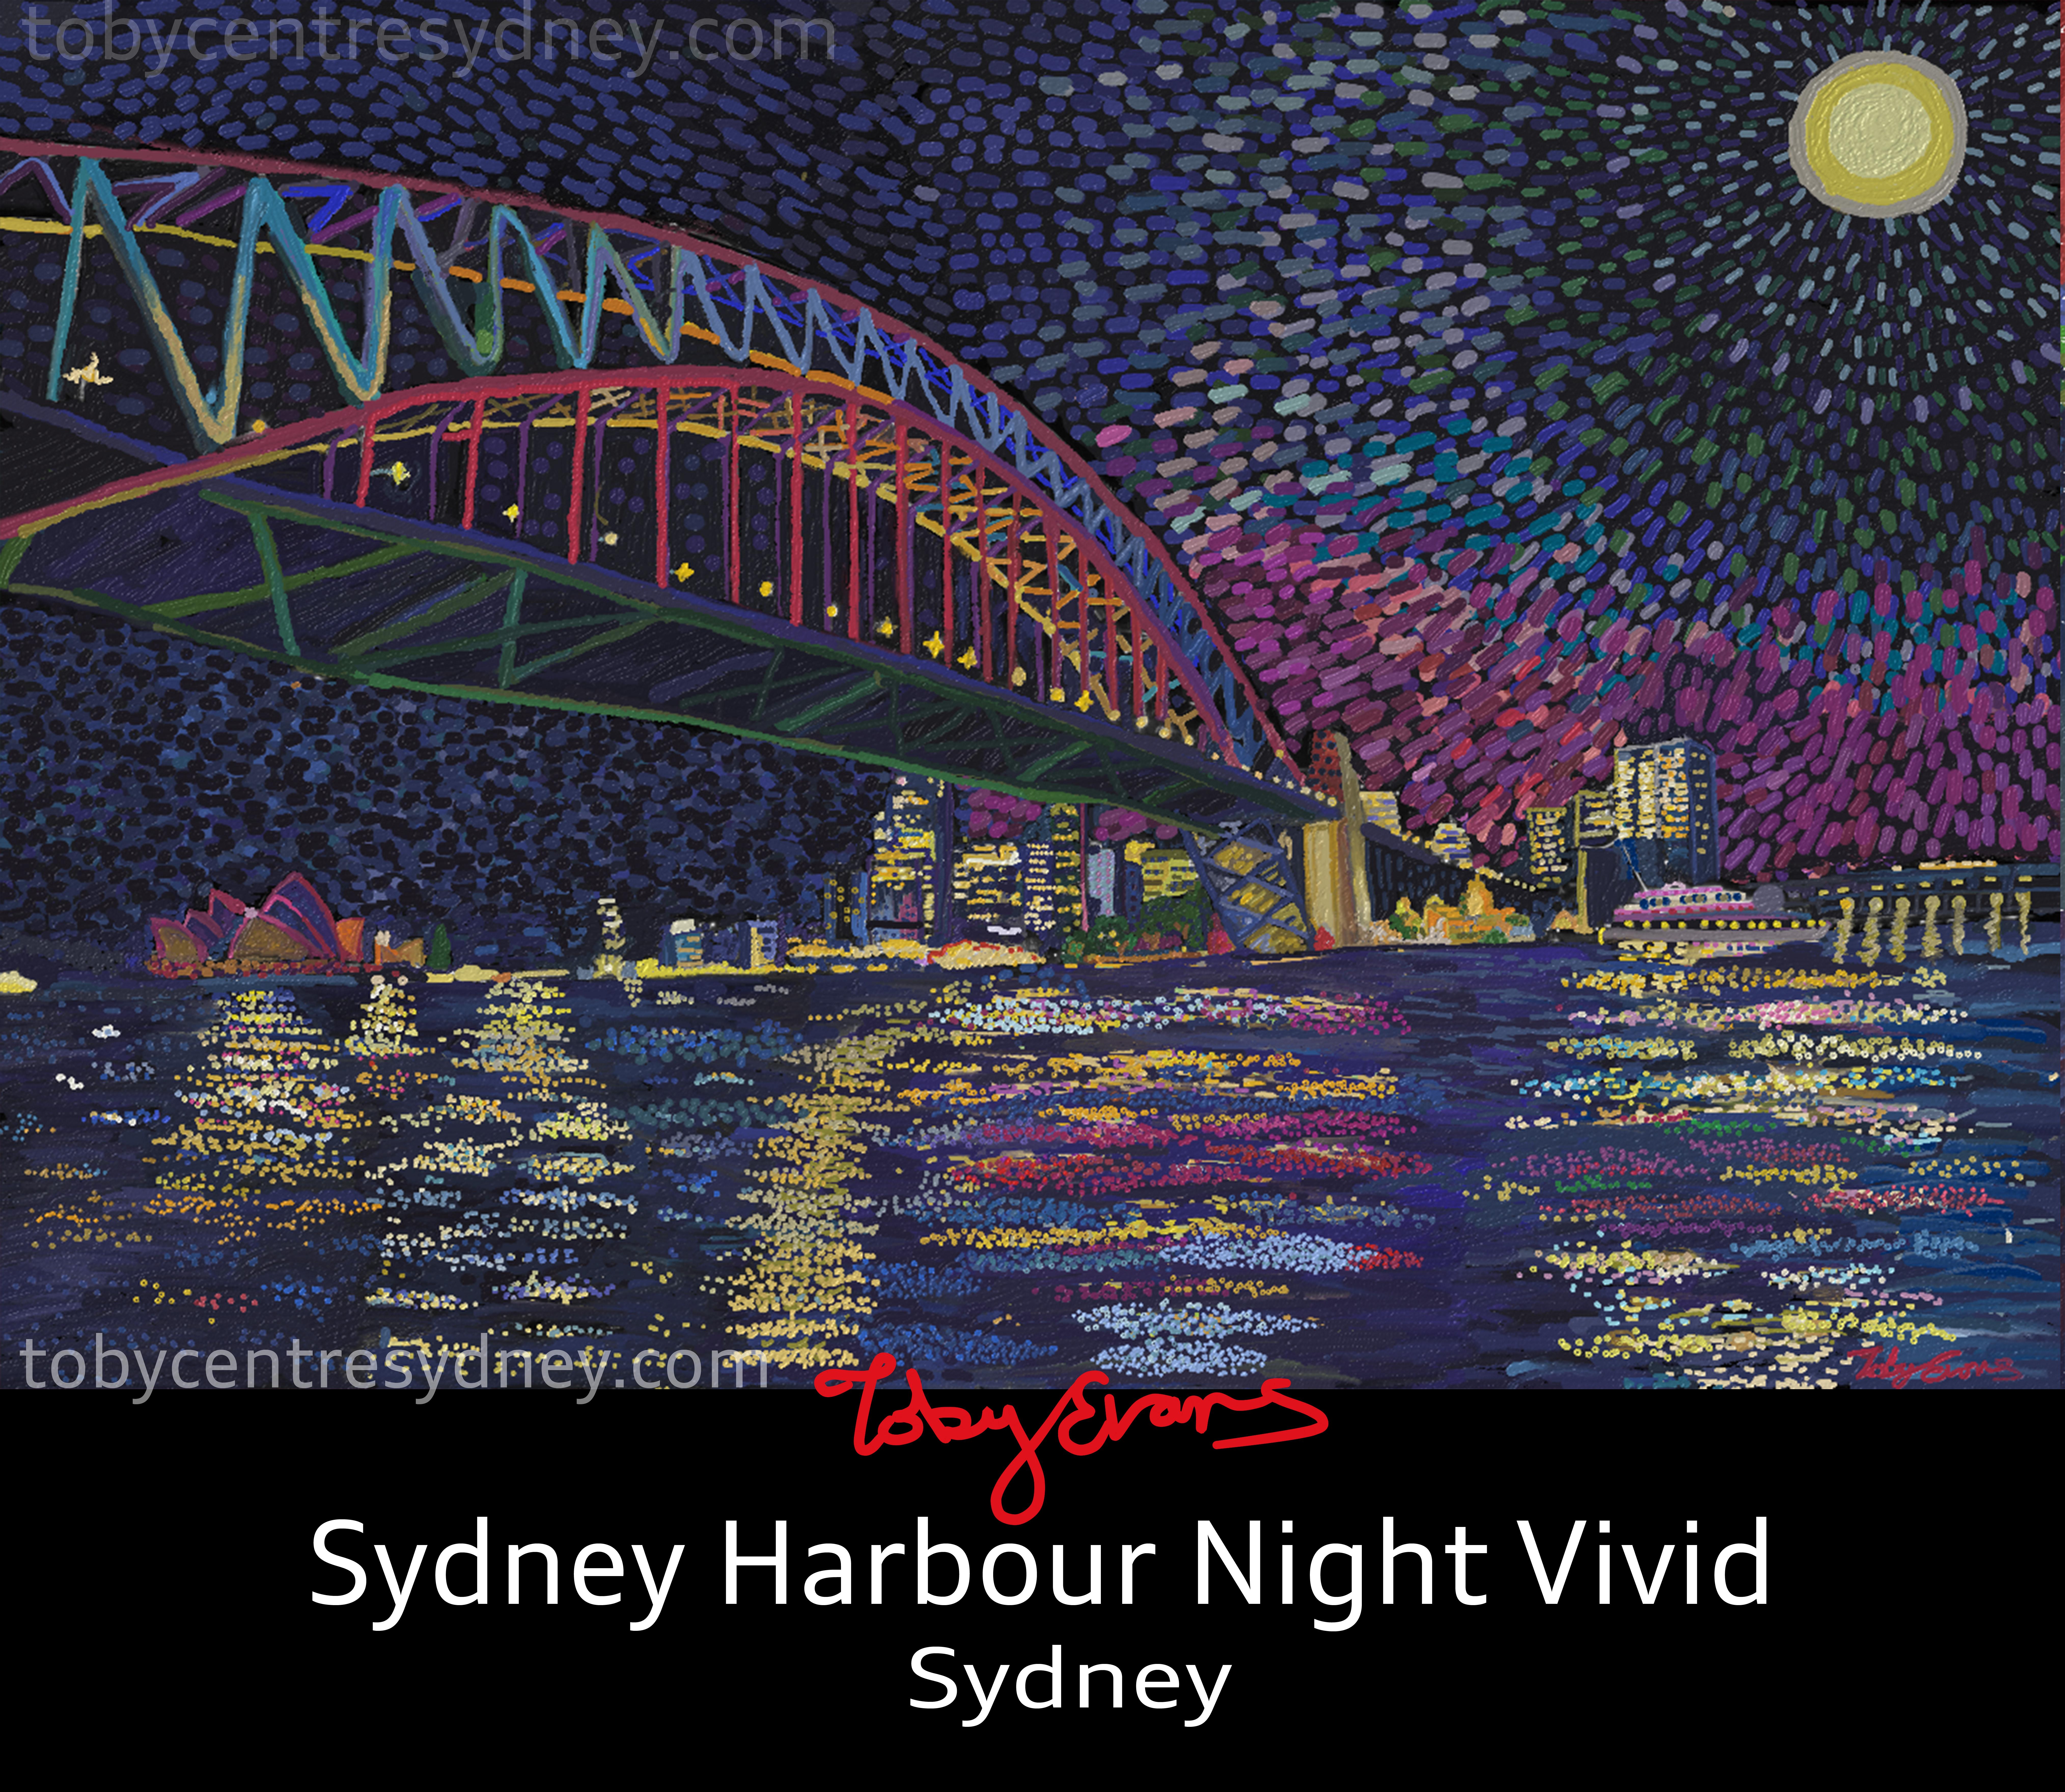 Sydney harbour night vivid